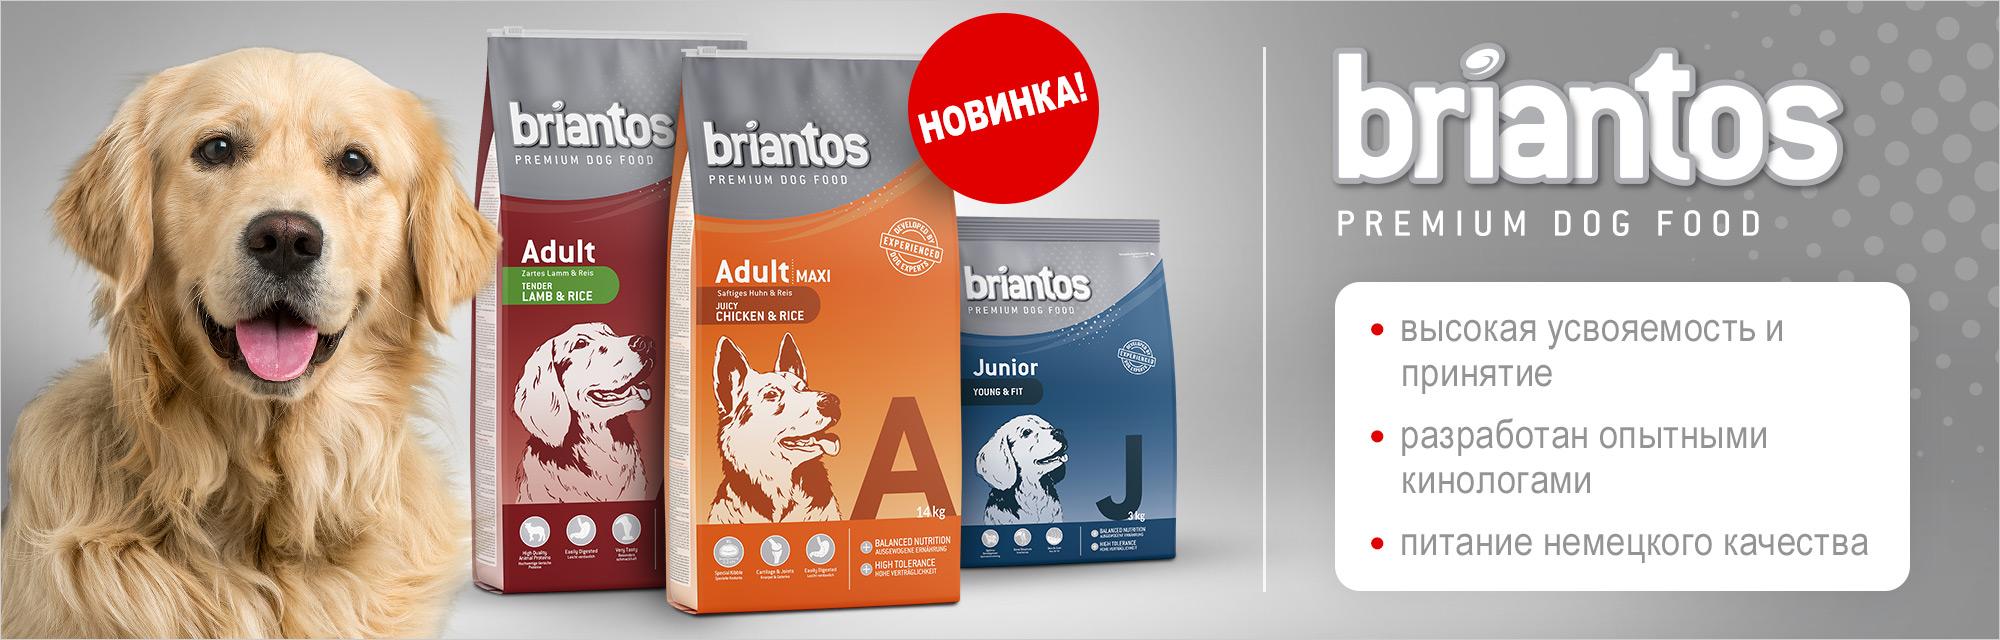 Briantos